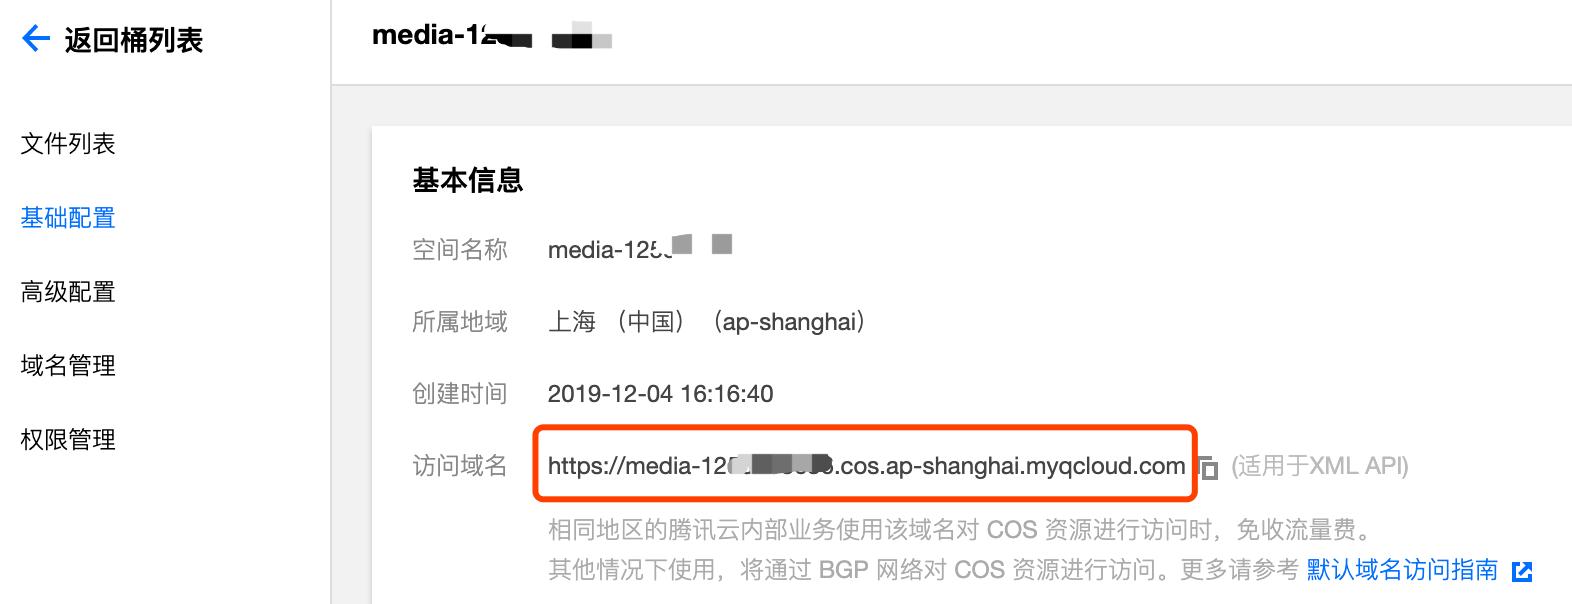 sync-qcloud-cos-2